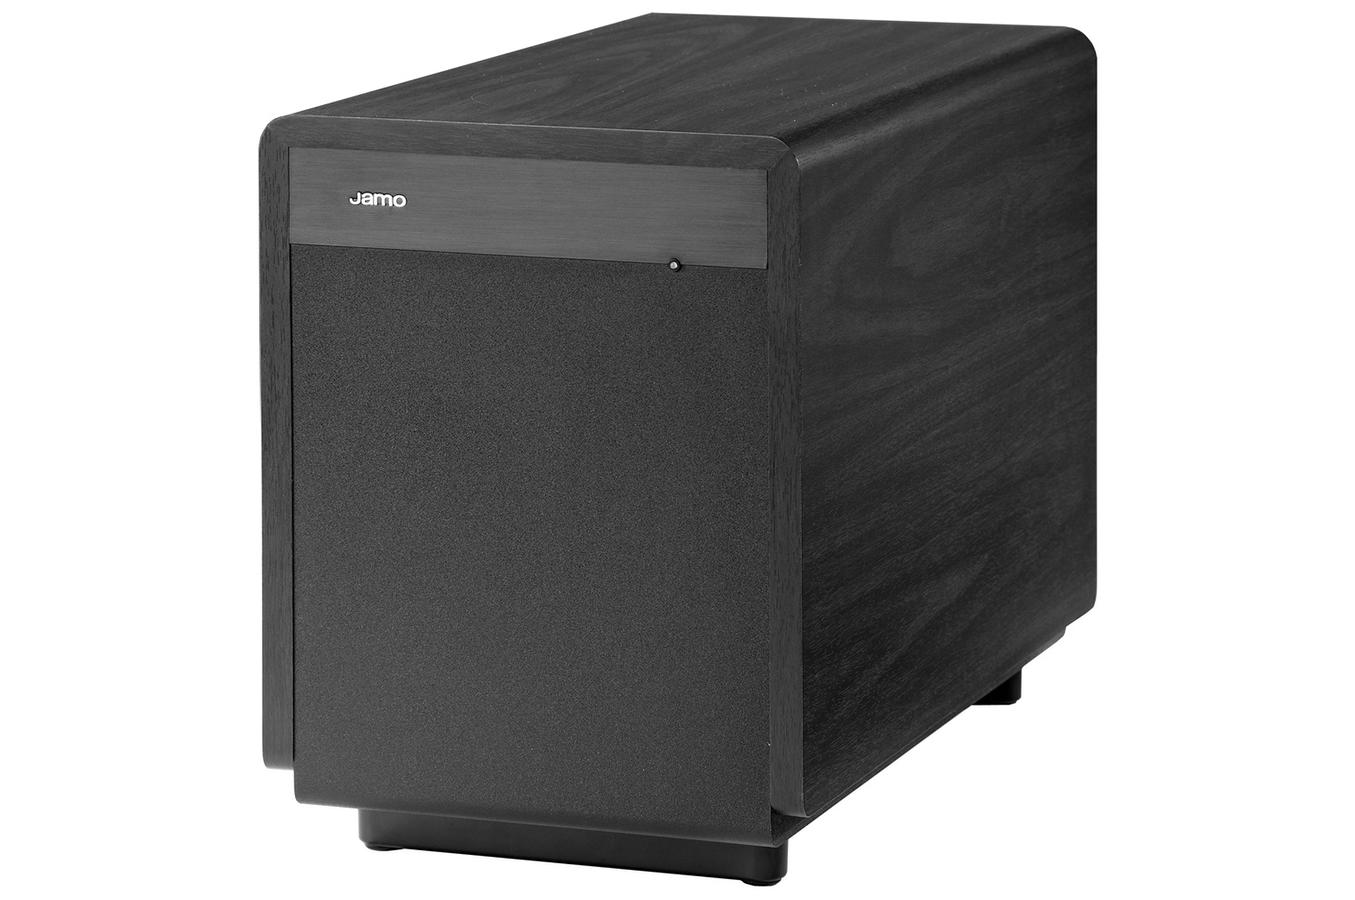 caisson de basses jamo sub 260 noir sub260 4020740 darty. Black Bedroom Furniture Sets. Home Design Ideas